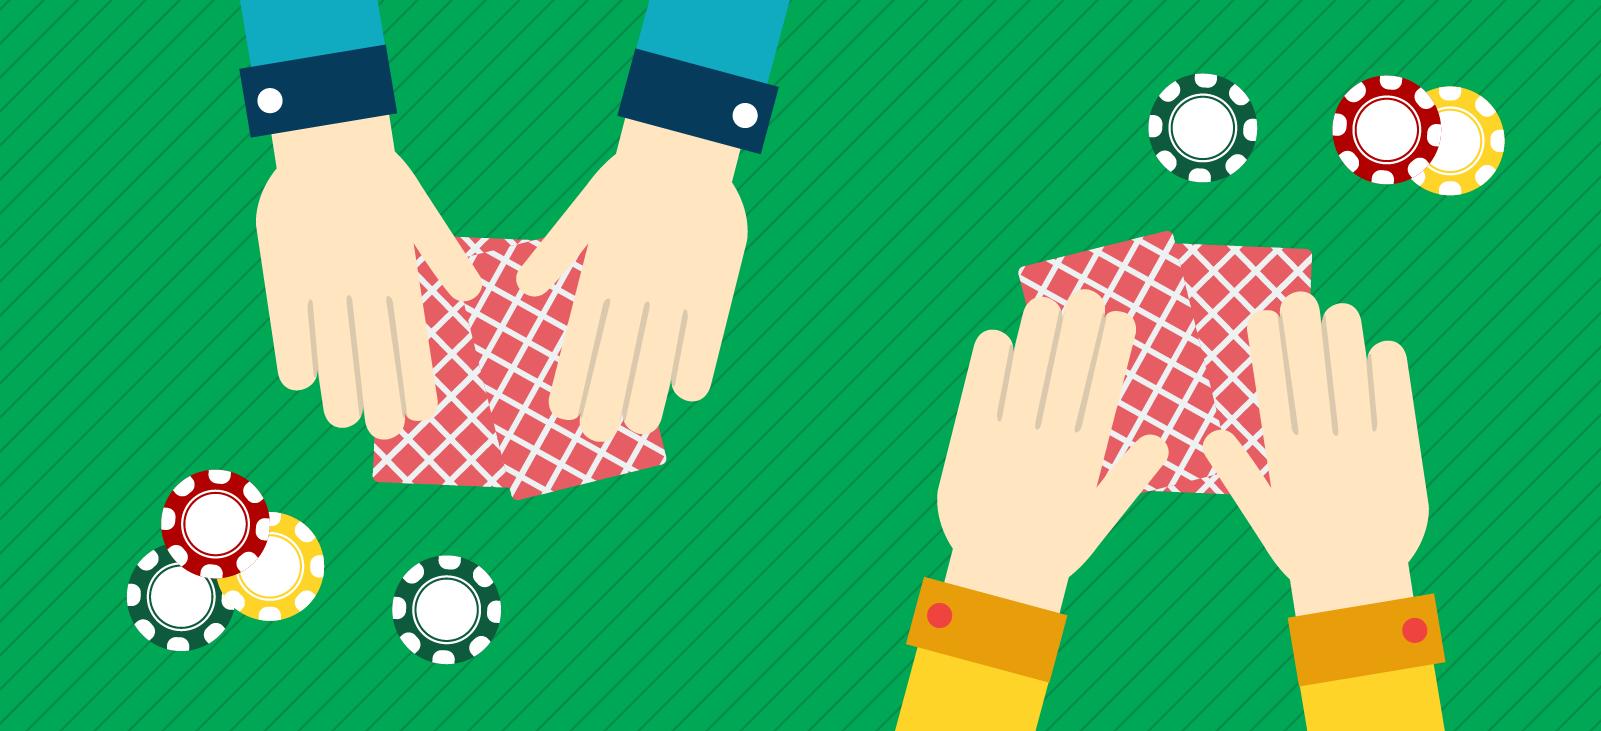 Win With Poker – สูตรบาคาร่า, เครดิตฟรี